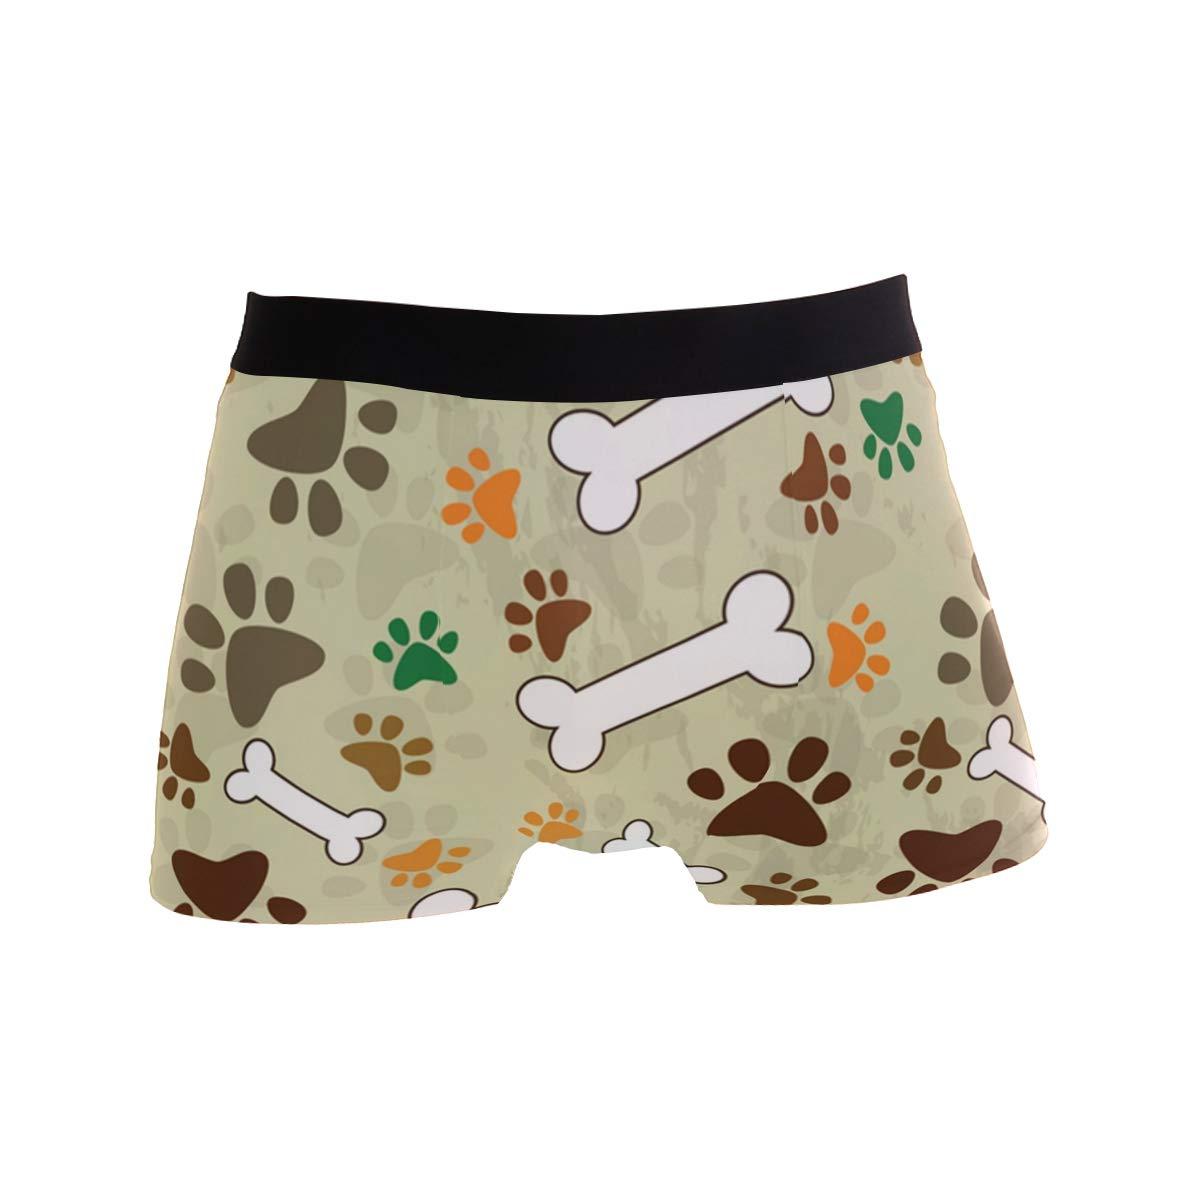 Hipster Dog Paw Print Bone Boxer Briefs Mens Underwear Pack Seamless Comfort Soft